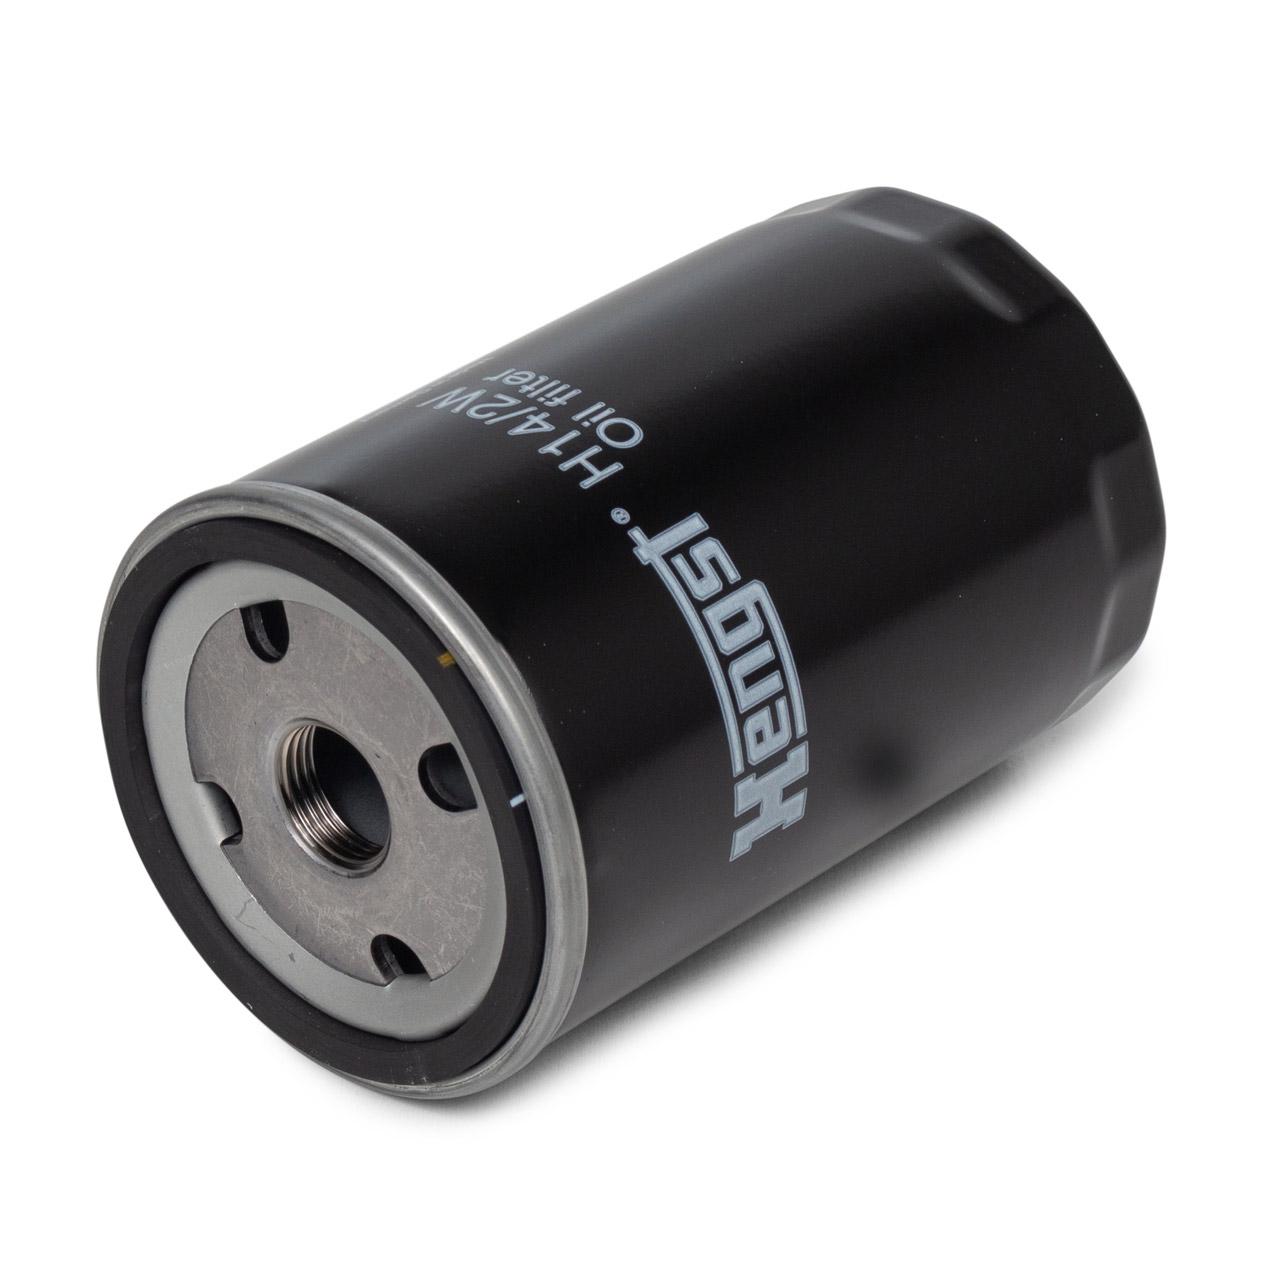 Inspektionskit Filterpaket Filterset für VW Golf III Vento 1.4 1.8 2.0 55-115 PS